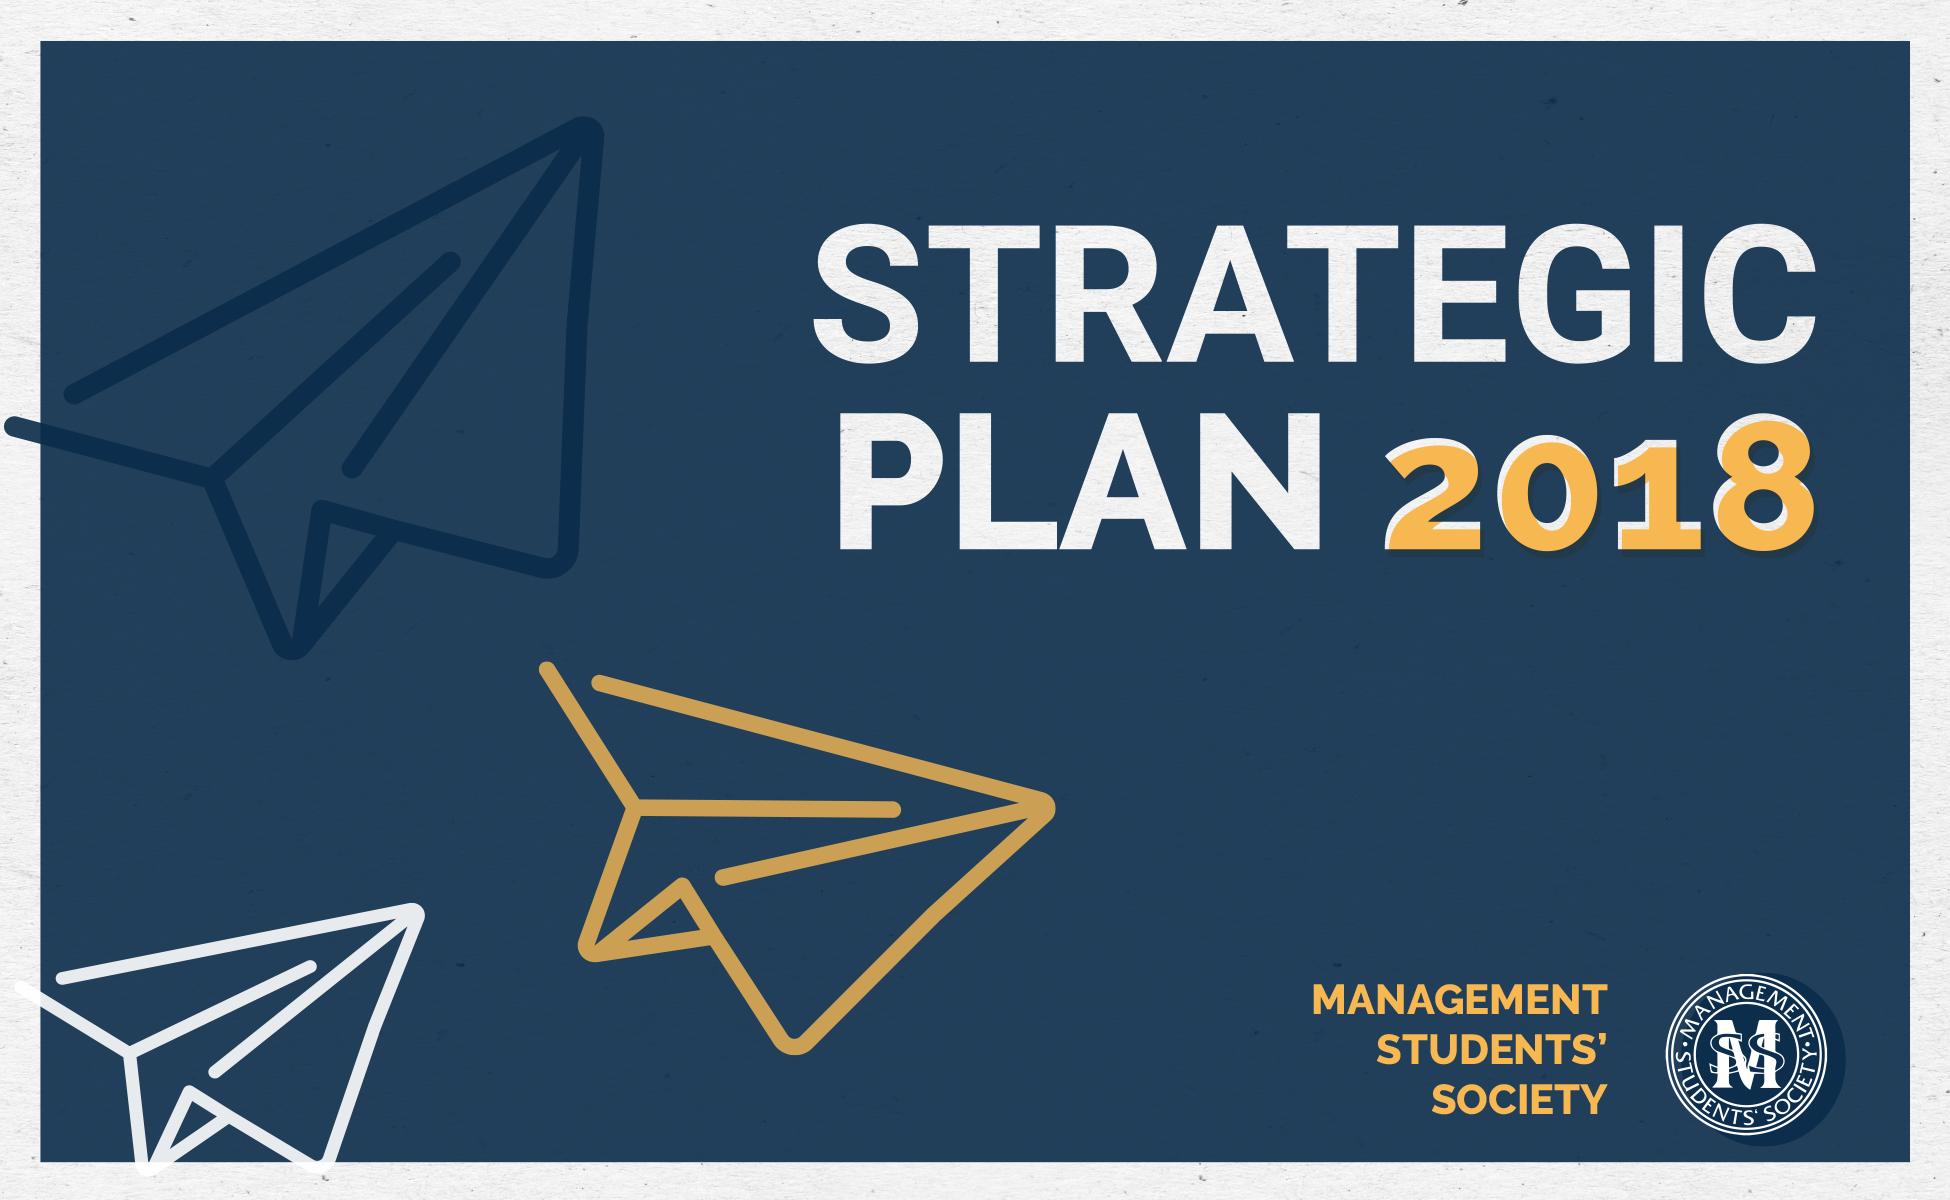 StrategicPlan-2018-1.png